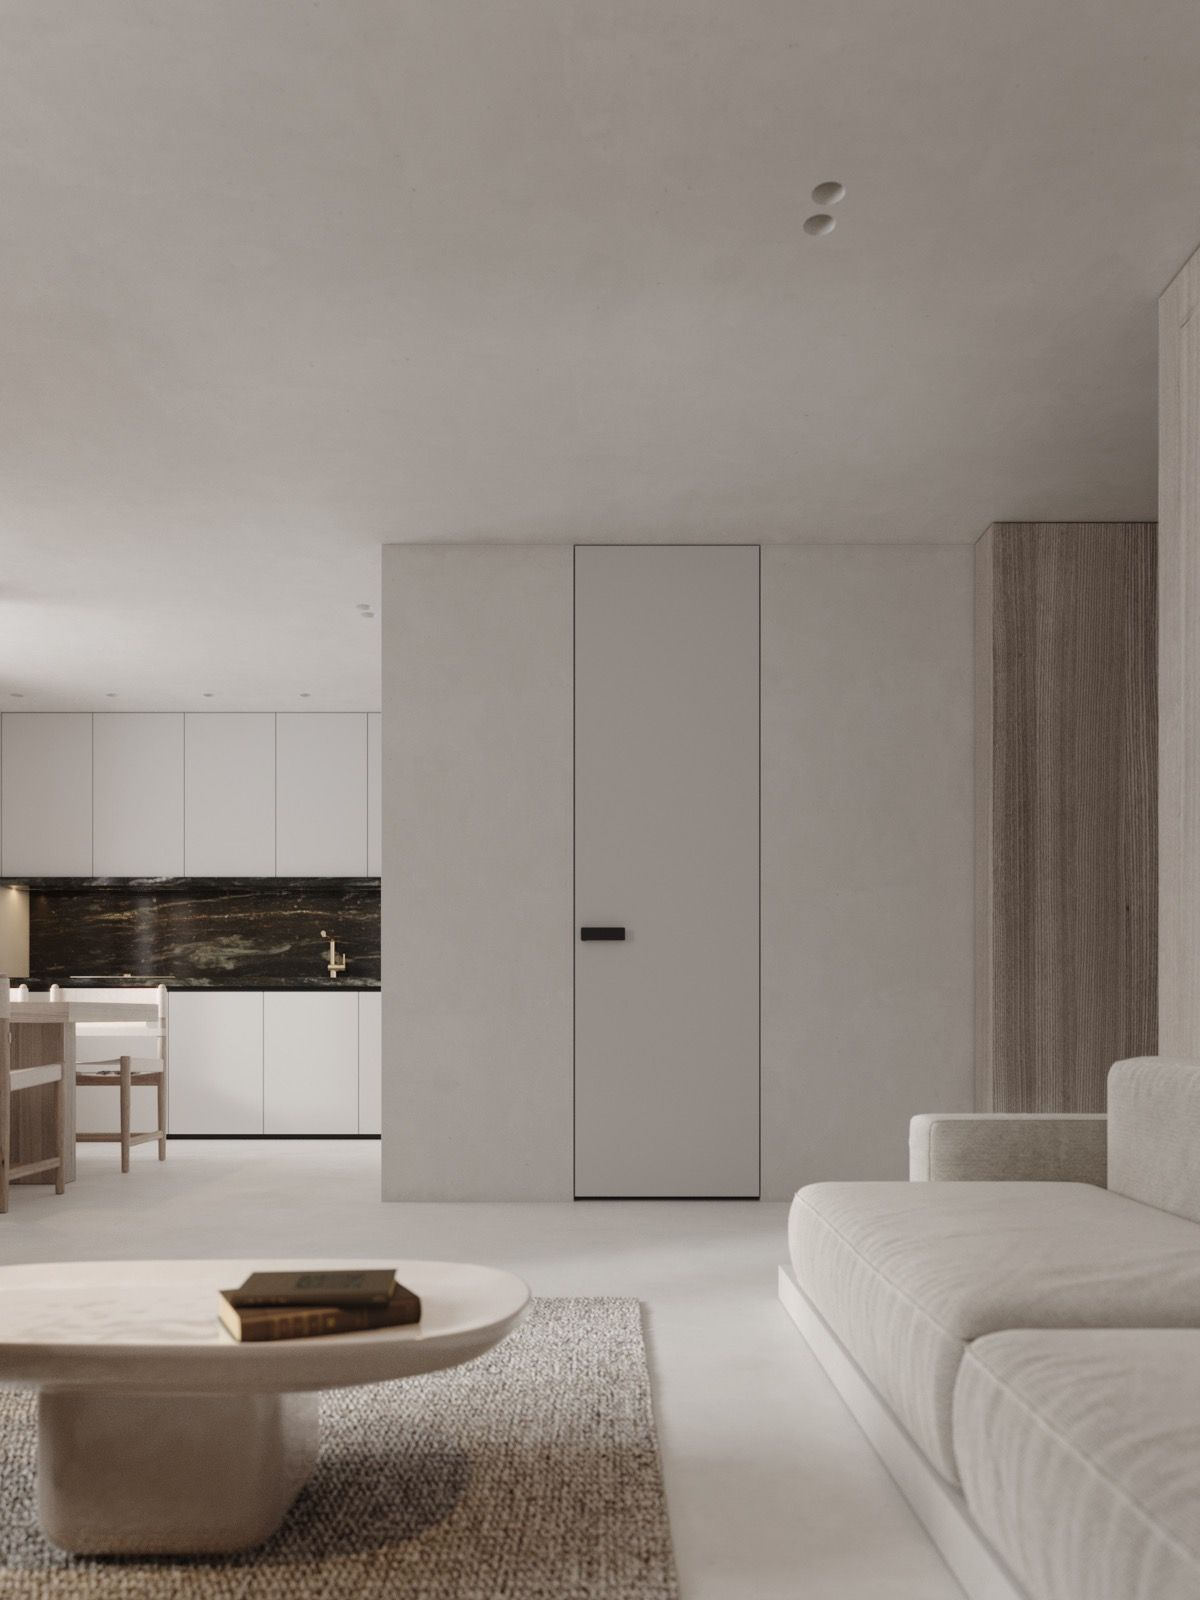 Neutral Modern Minimalist Interior Design 4 Examples That Masterfully Show Us How 이미지 포함 인테리어 아이디어 현대 거실 미니멀리즘 집